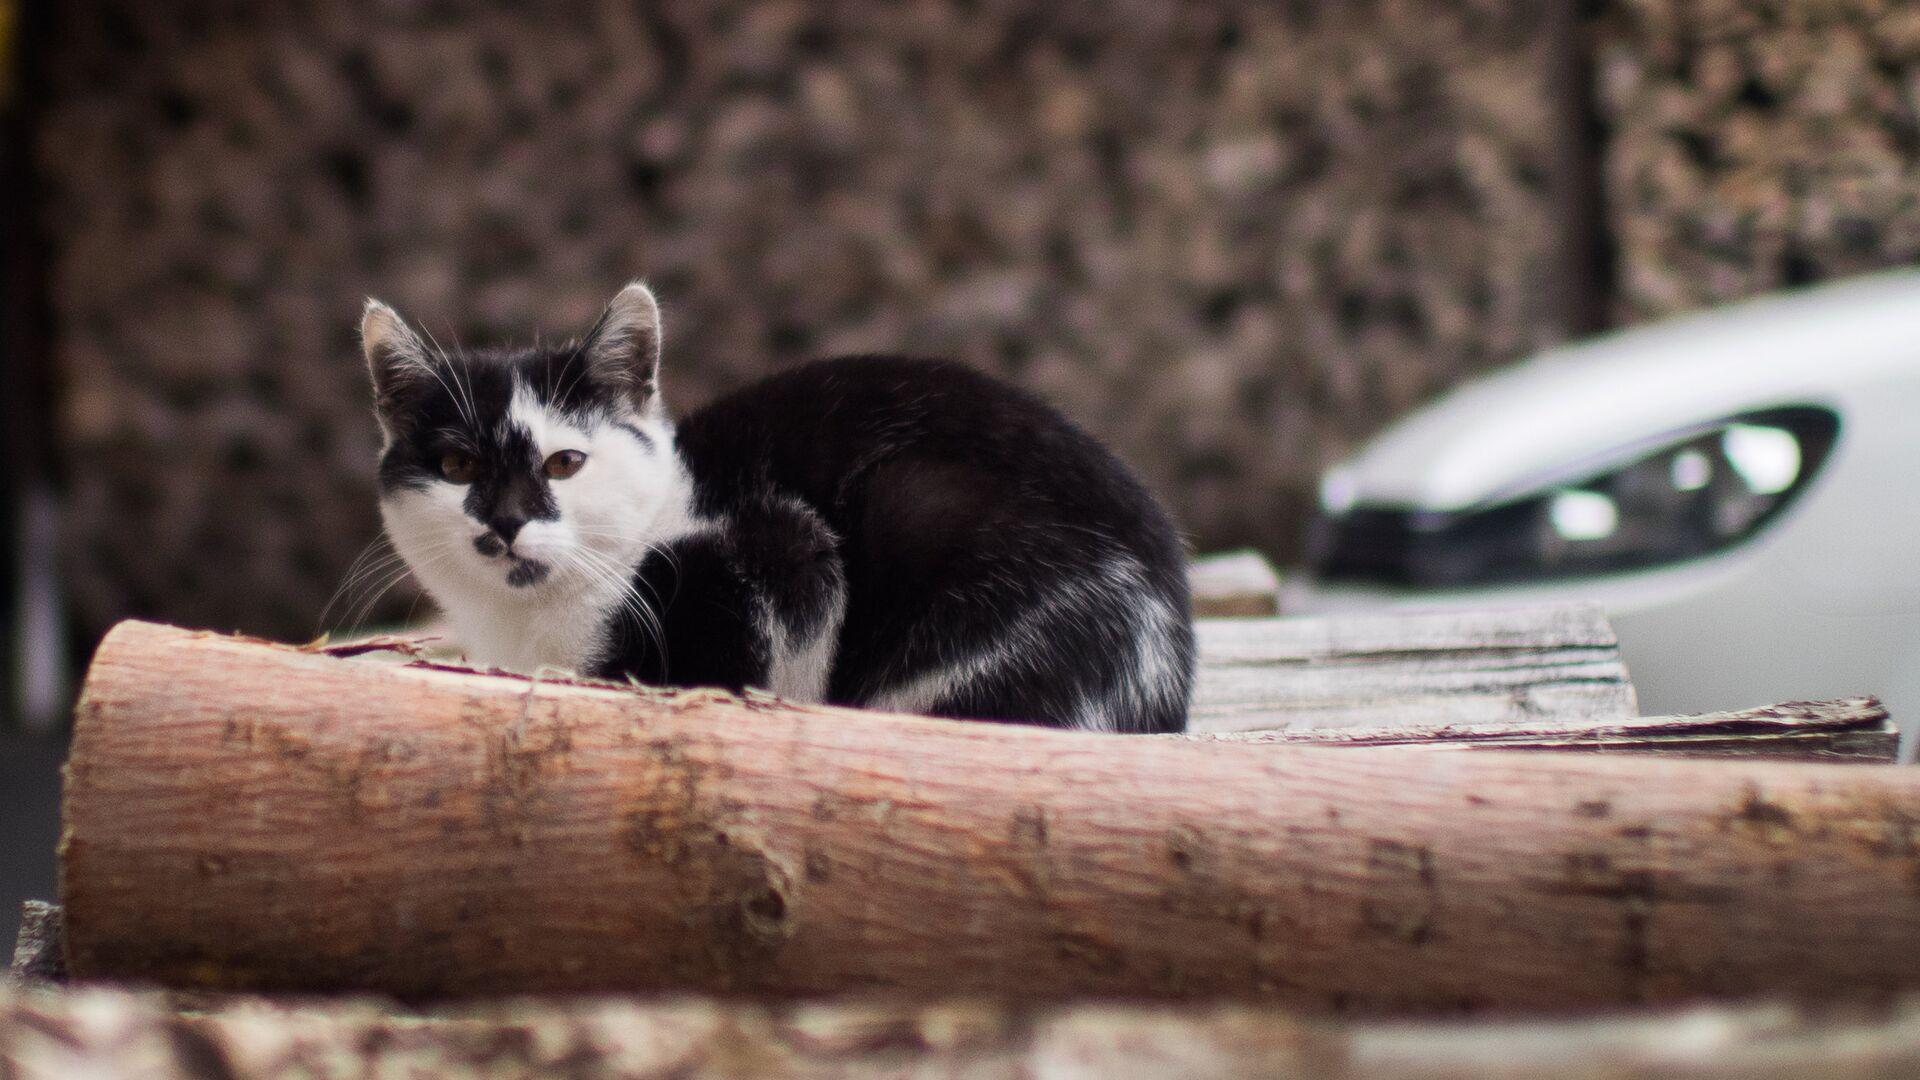 406645672 0:29:2603:1493 1920x0 80 0 0 2ac7ff36839bab603fe453dc02abc512 - В Москве сняли с дерева обессилевшую кошку